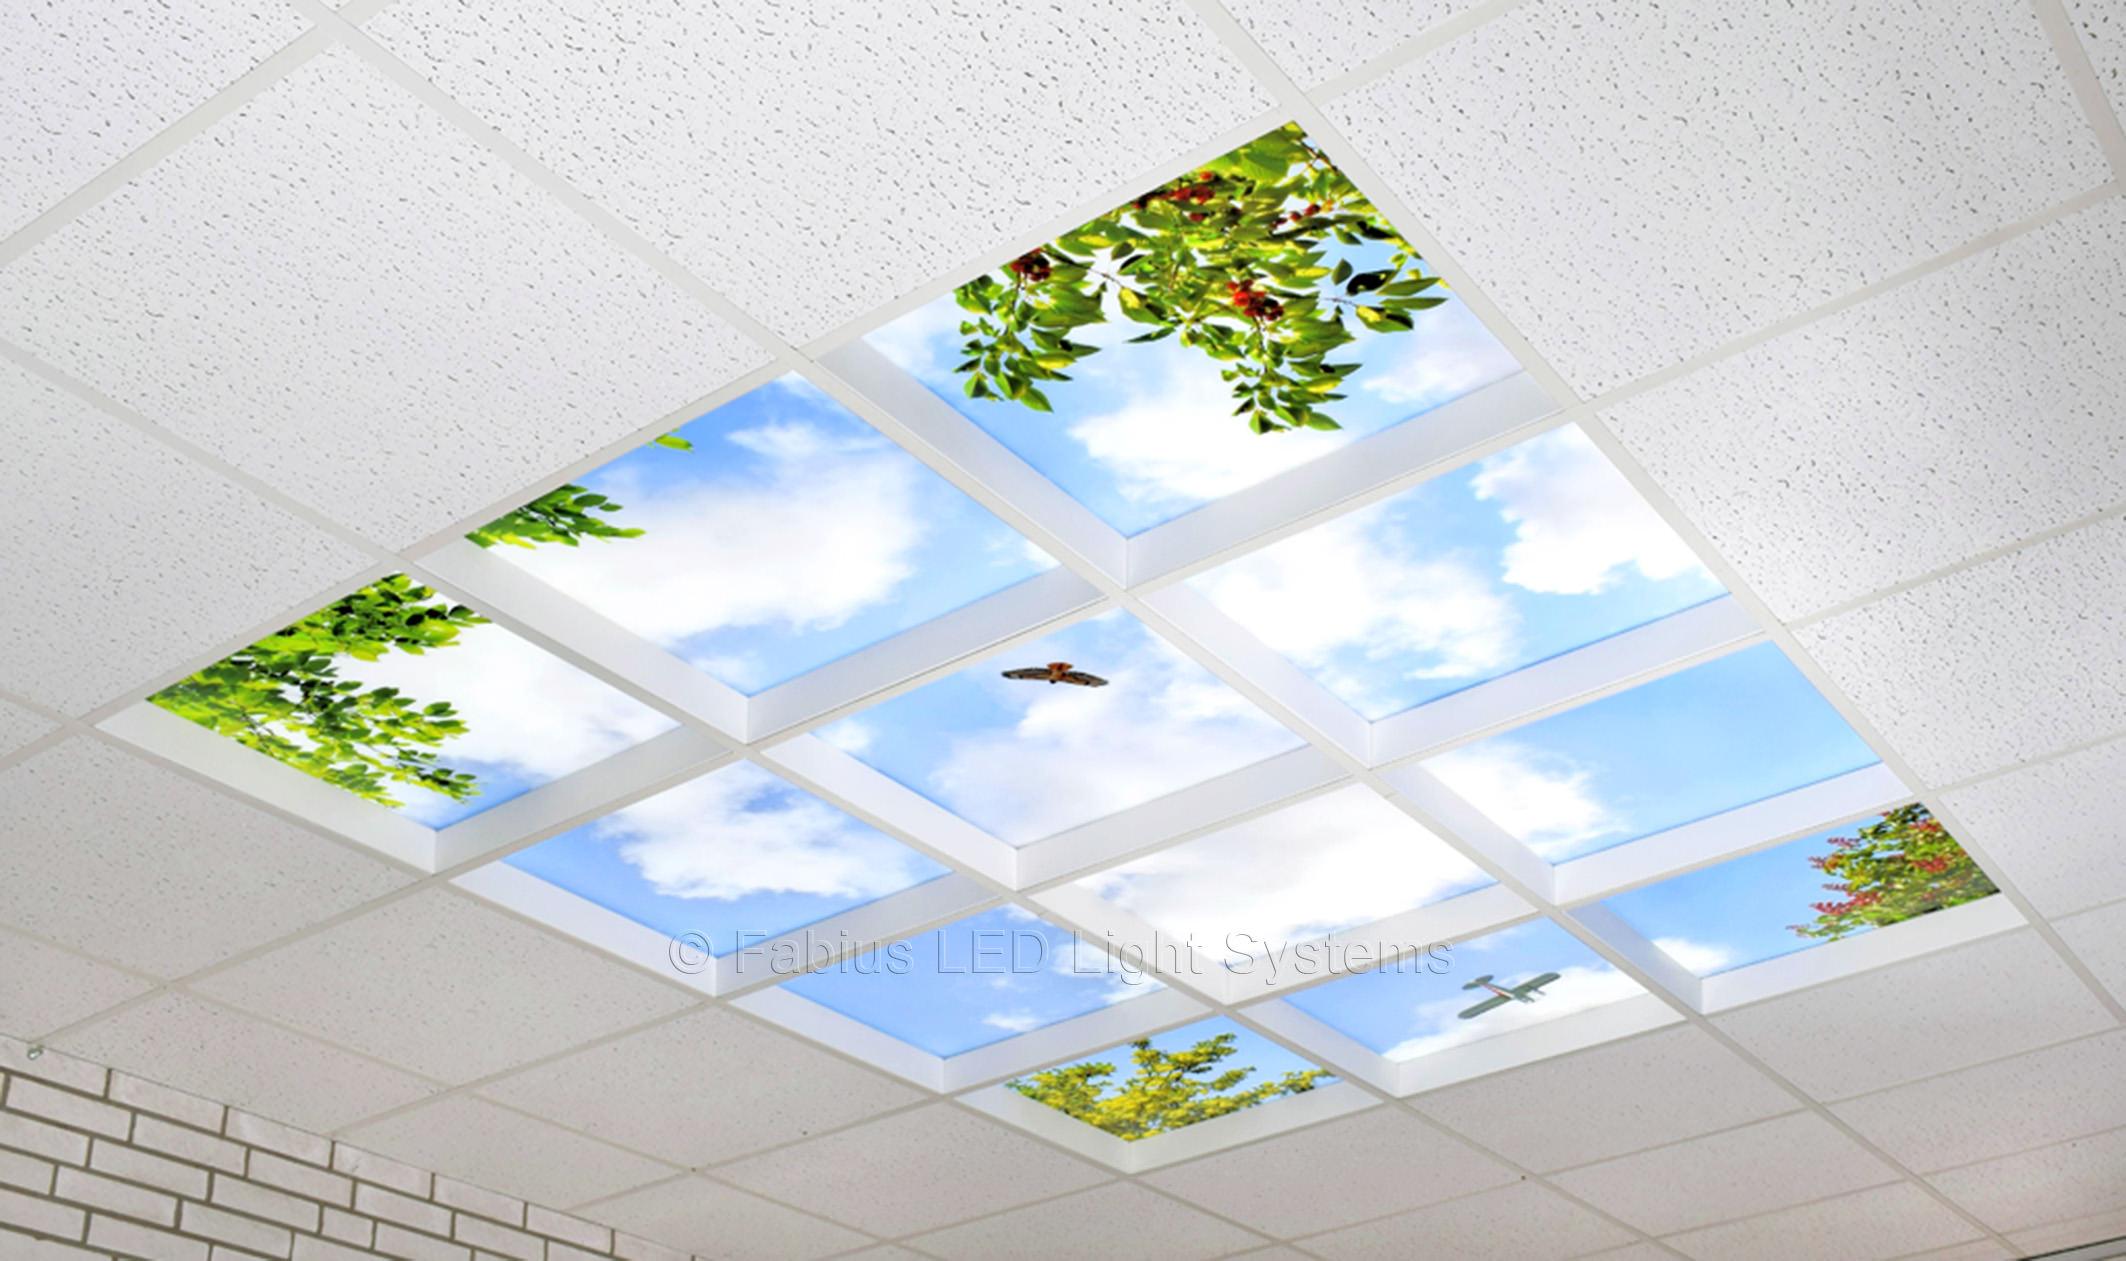 Häufig www.fabius-led.eu - Fabius LED Himmel Sky Panel Presentation Stand GE26